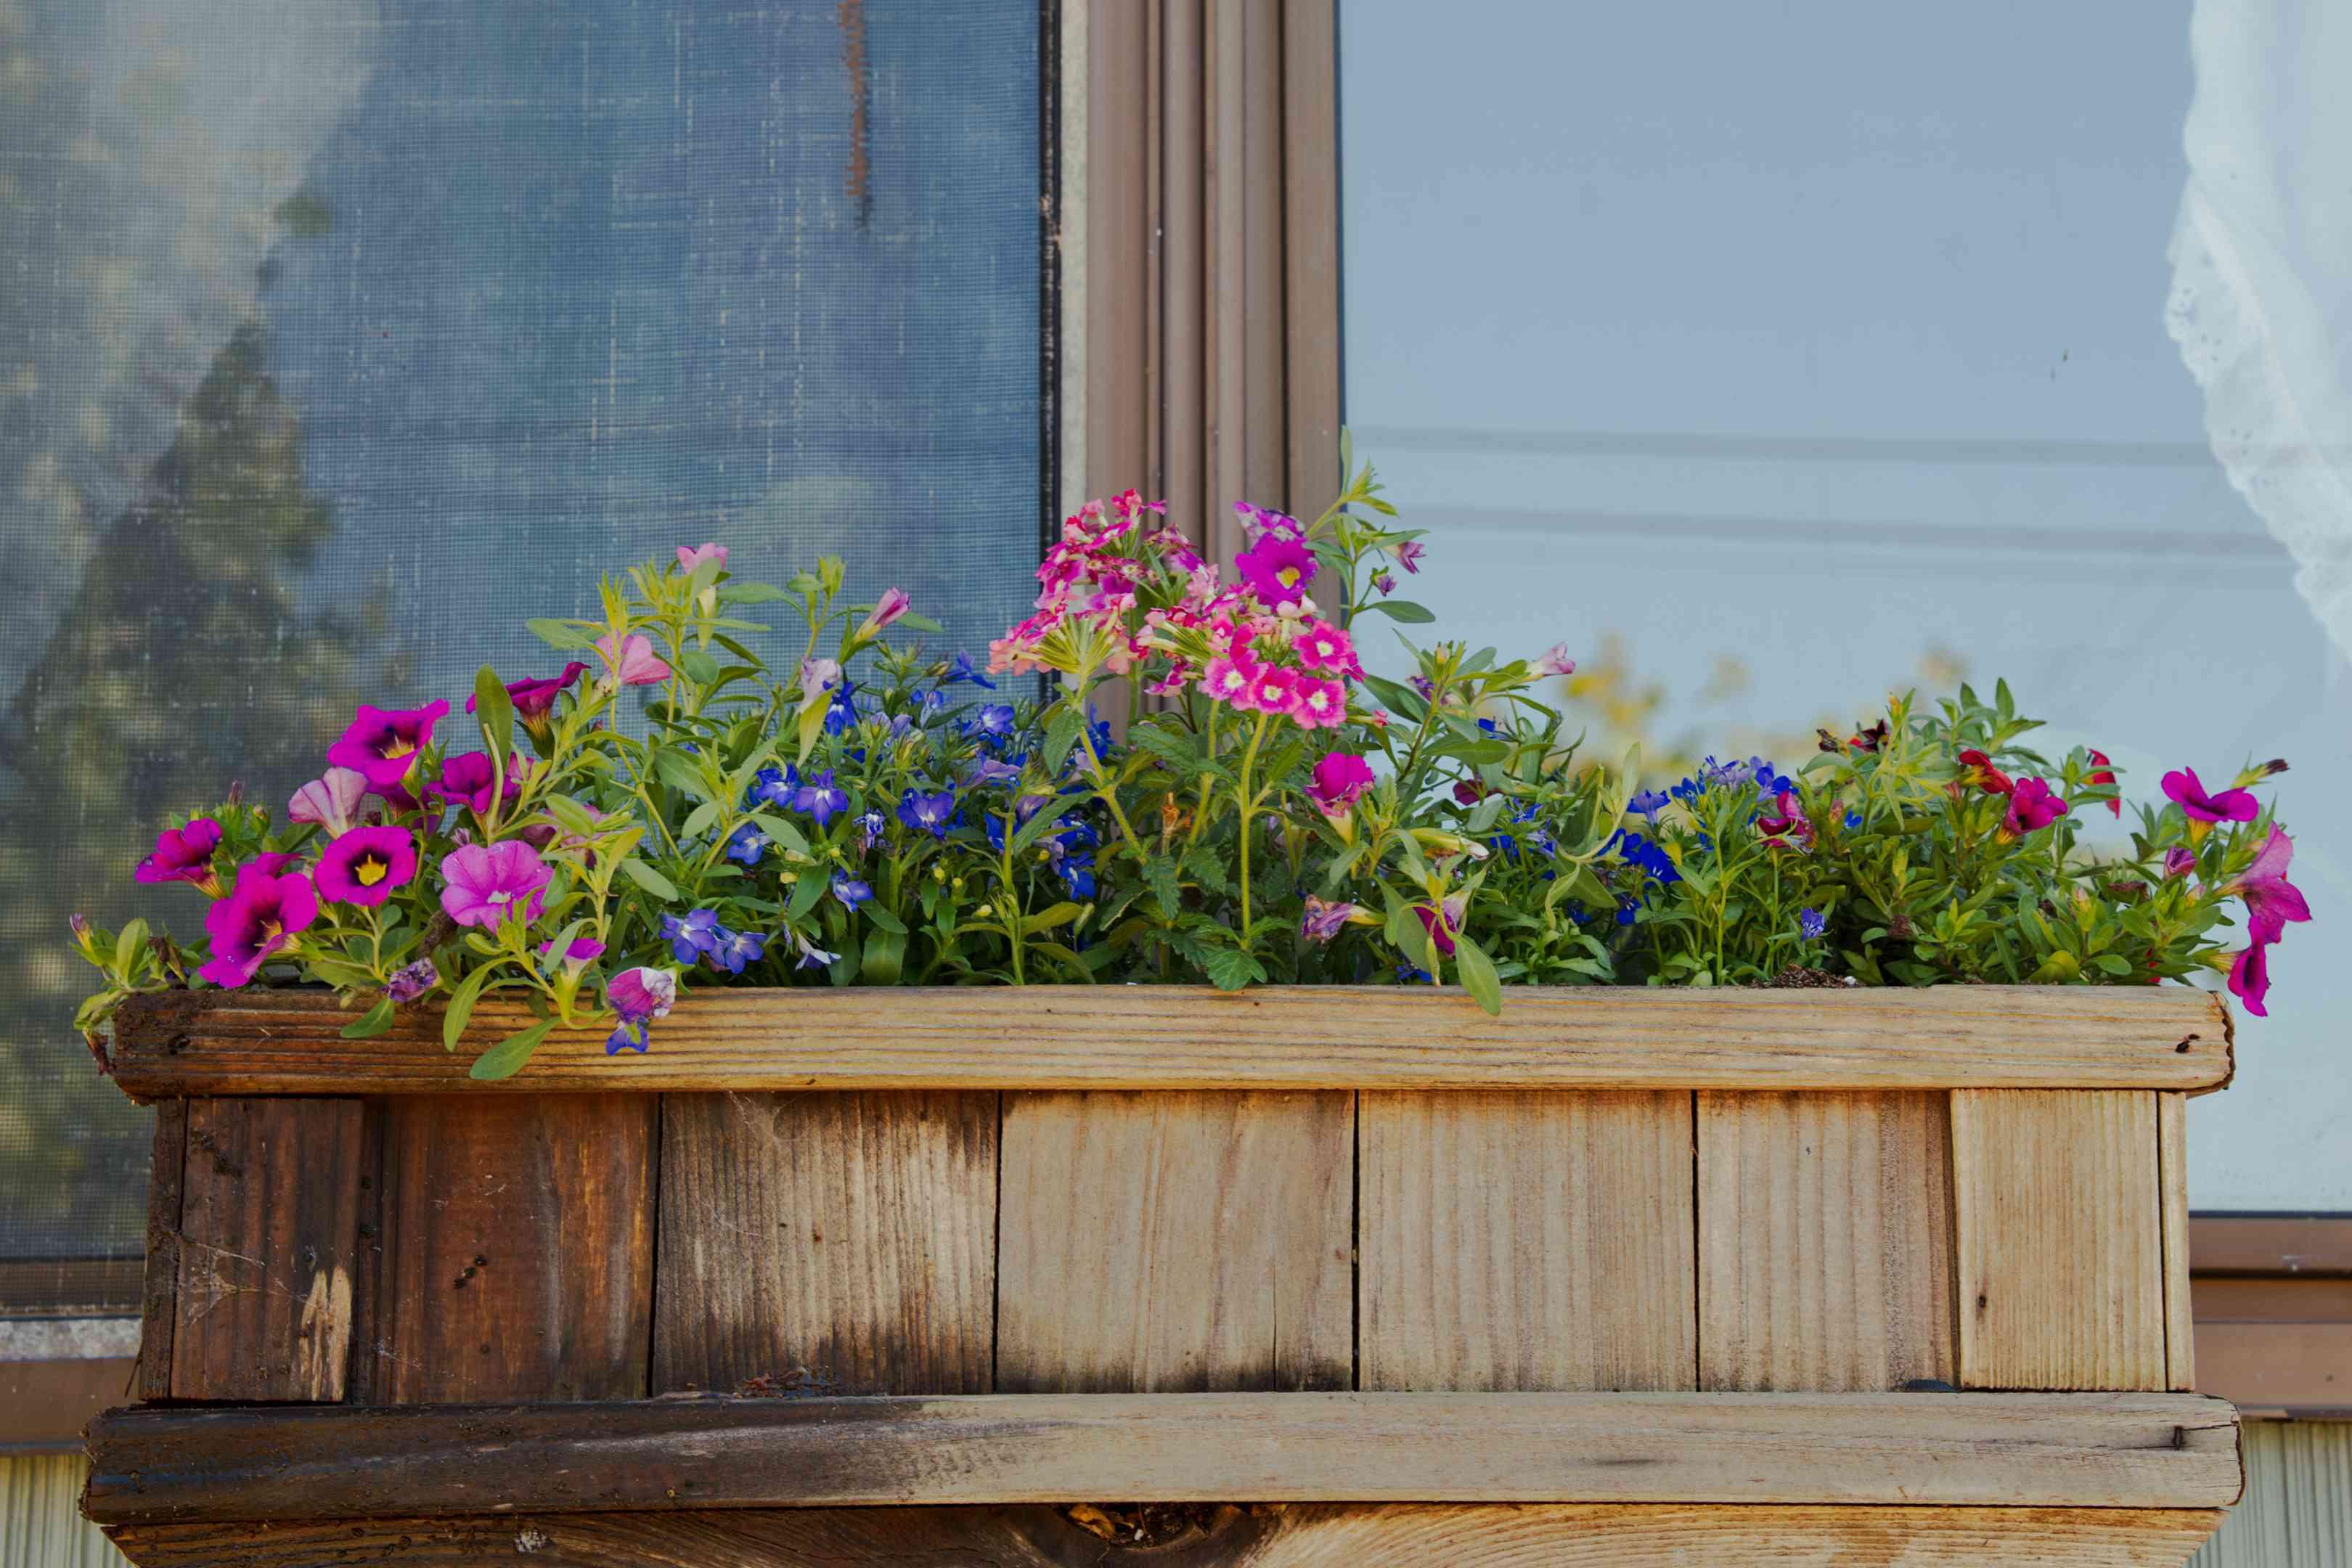 purple and blue flowers peek from wooden window box outside of house